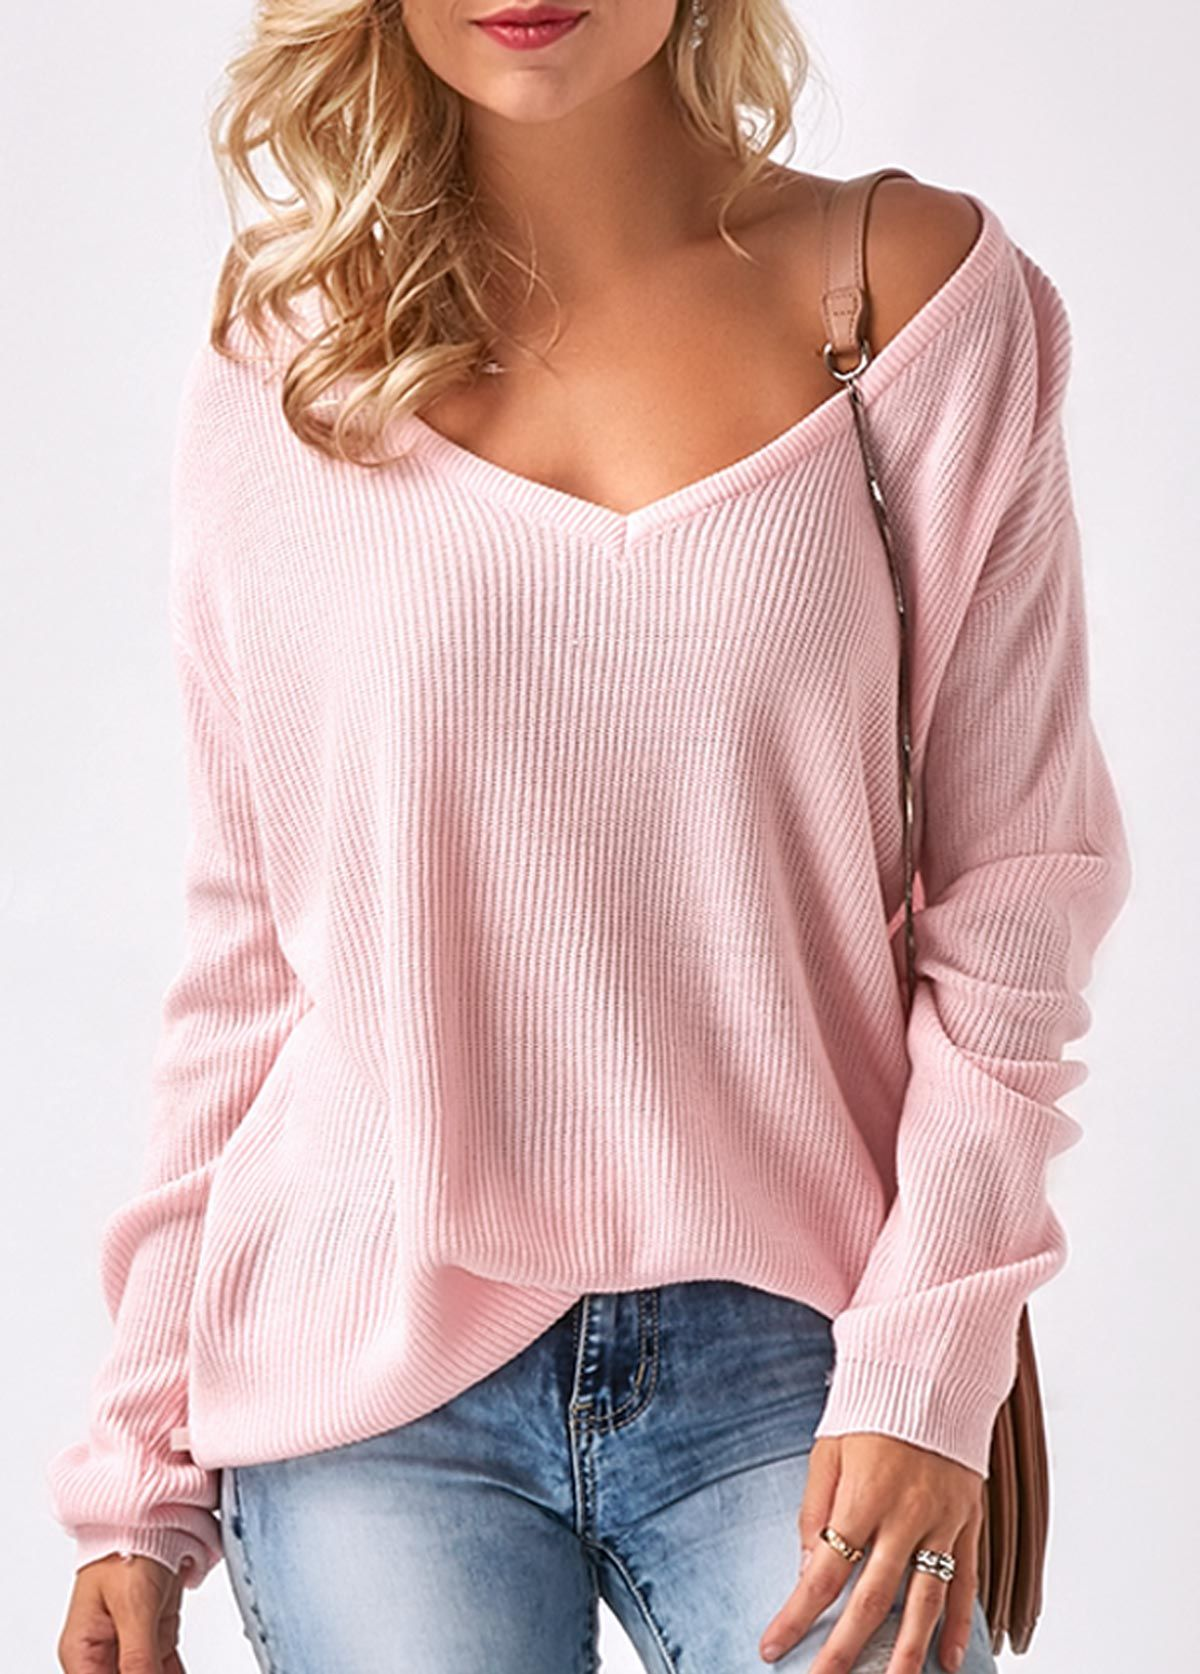 V Neck Long Sleeve Pink Sweater Stitch Fix Pinterest Sweaters